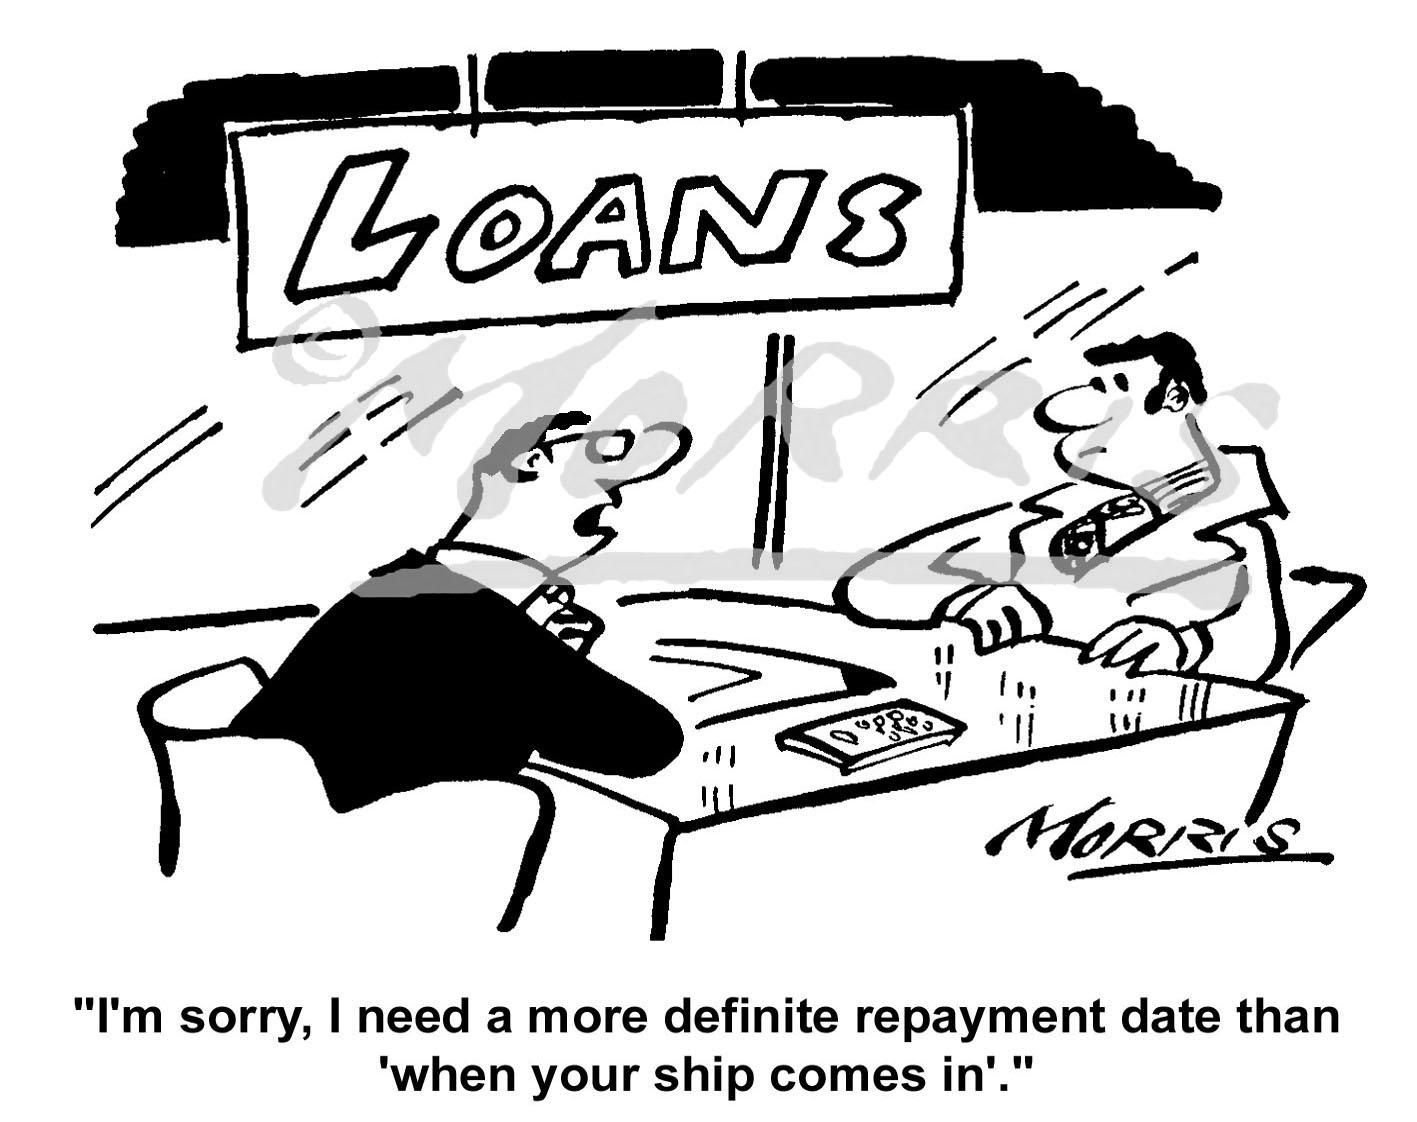 Bank loan cartoon Ref: 1433bw